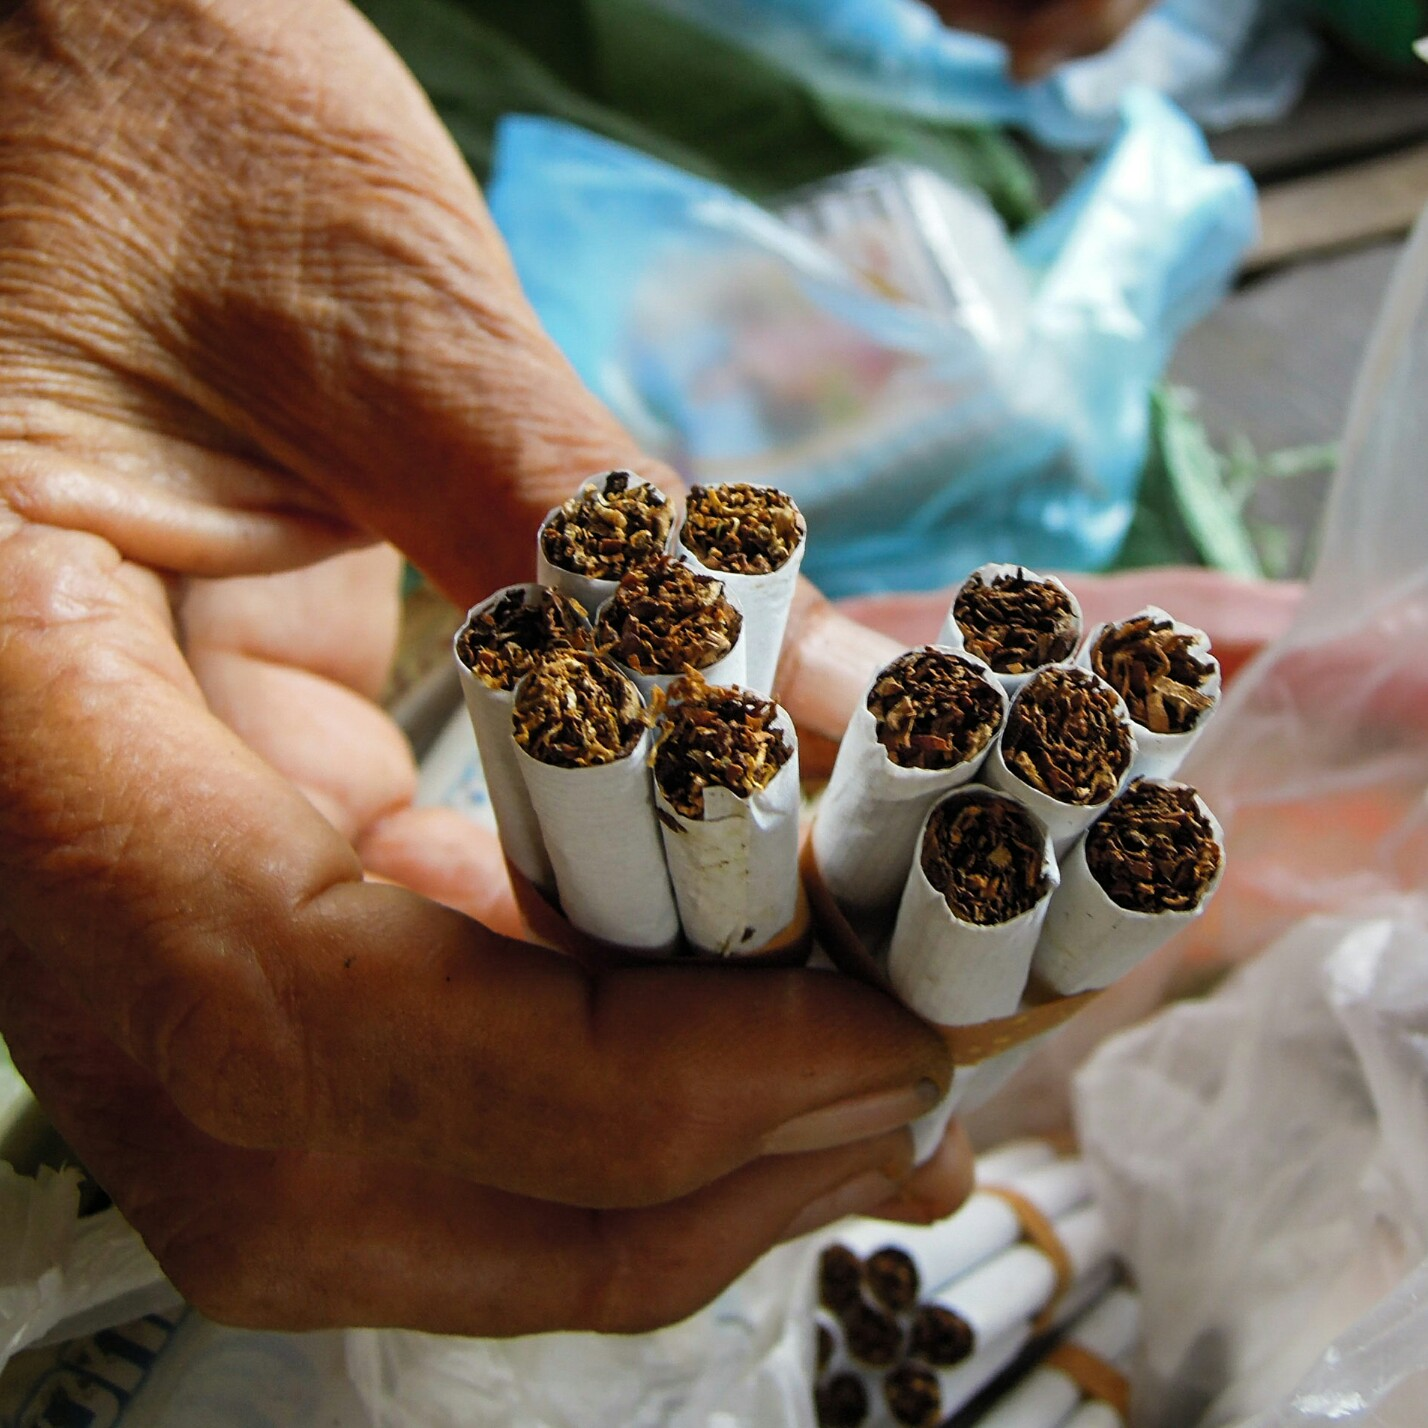 Handrolled cigarettes, zwei Sorten Zigaretten